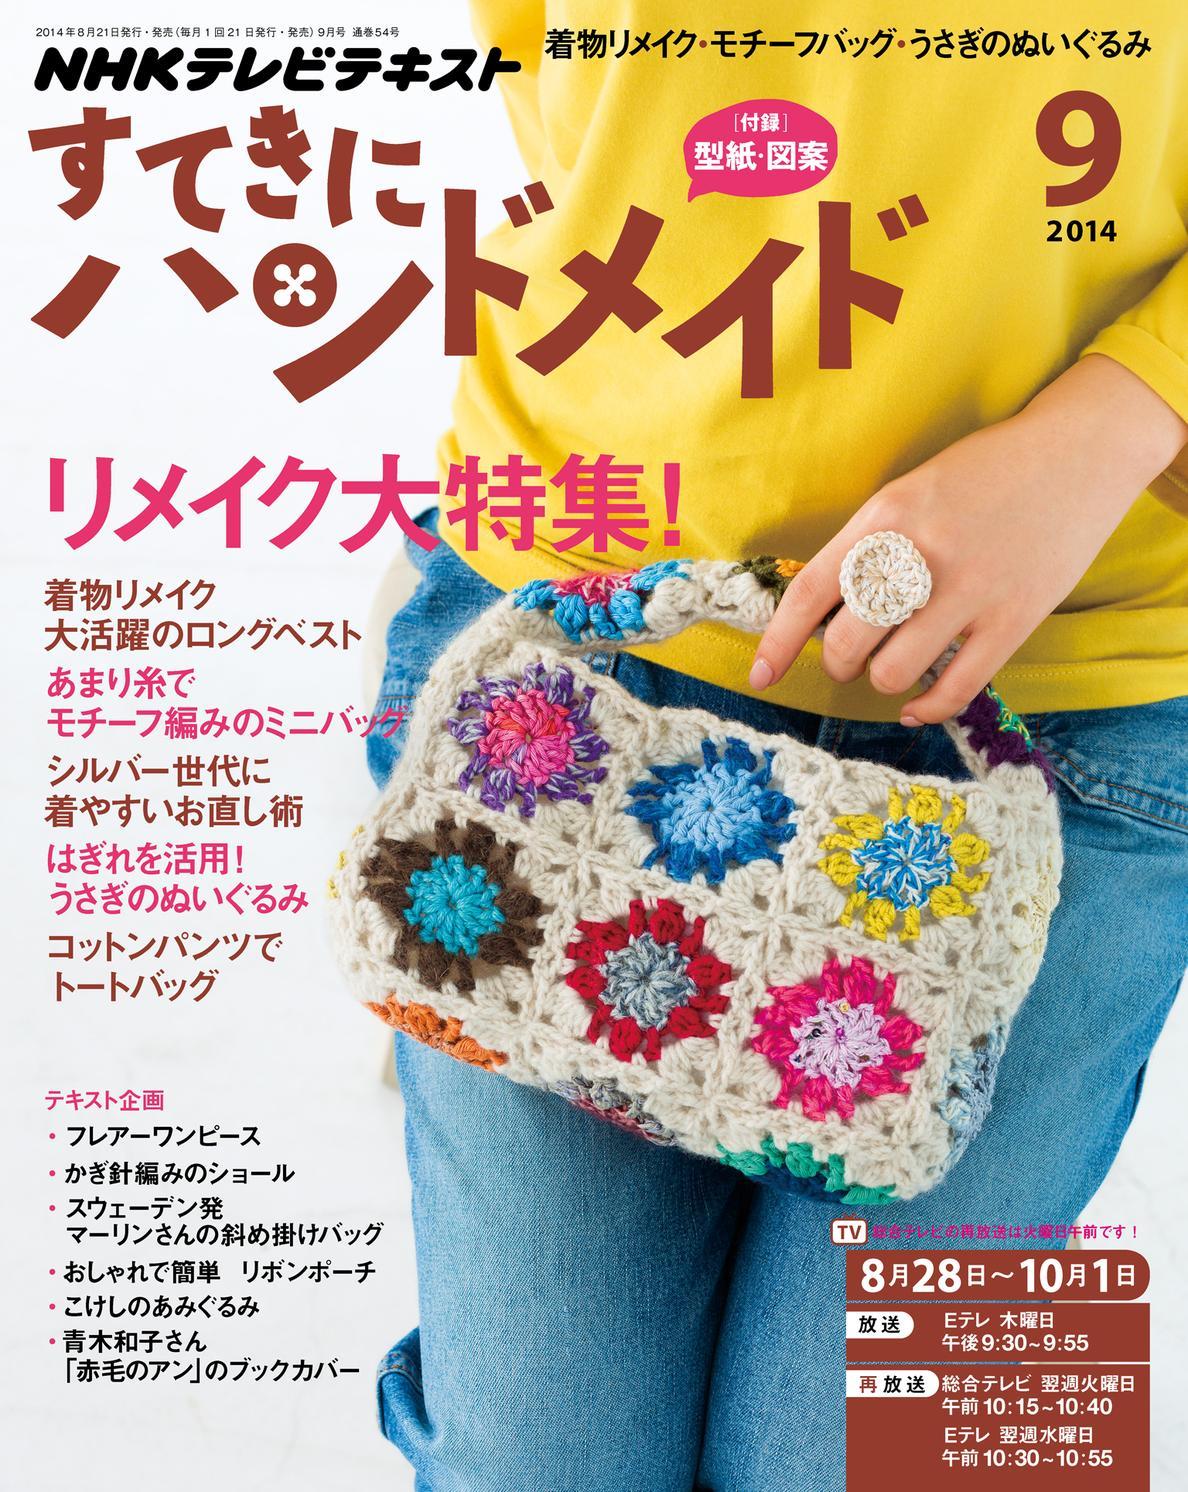 NHK すてきにハンドメイド 17%OFF   Fujisan.co.jp …